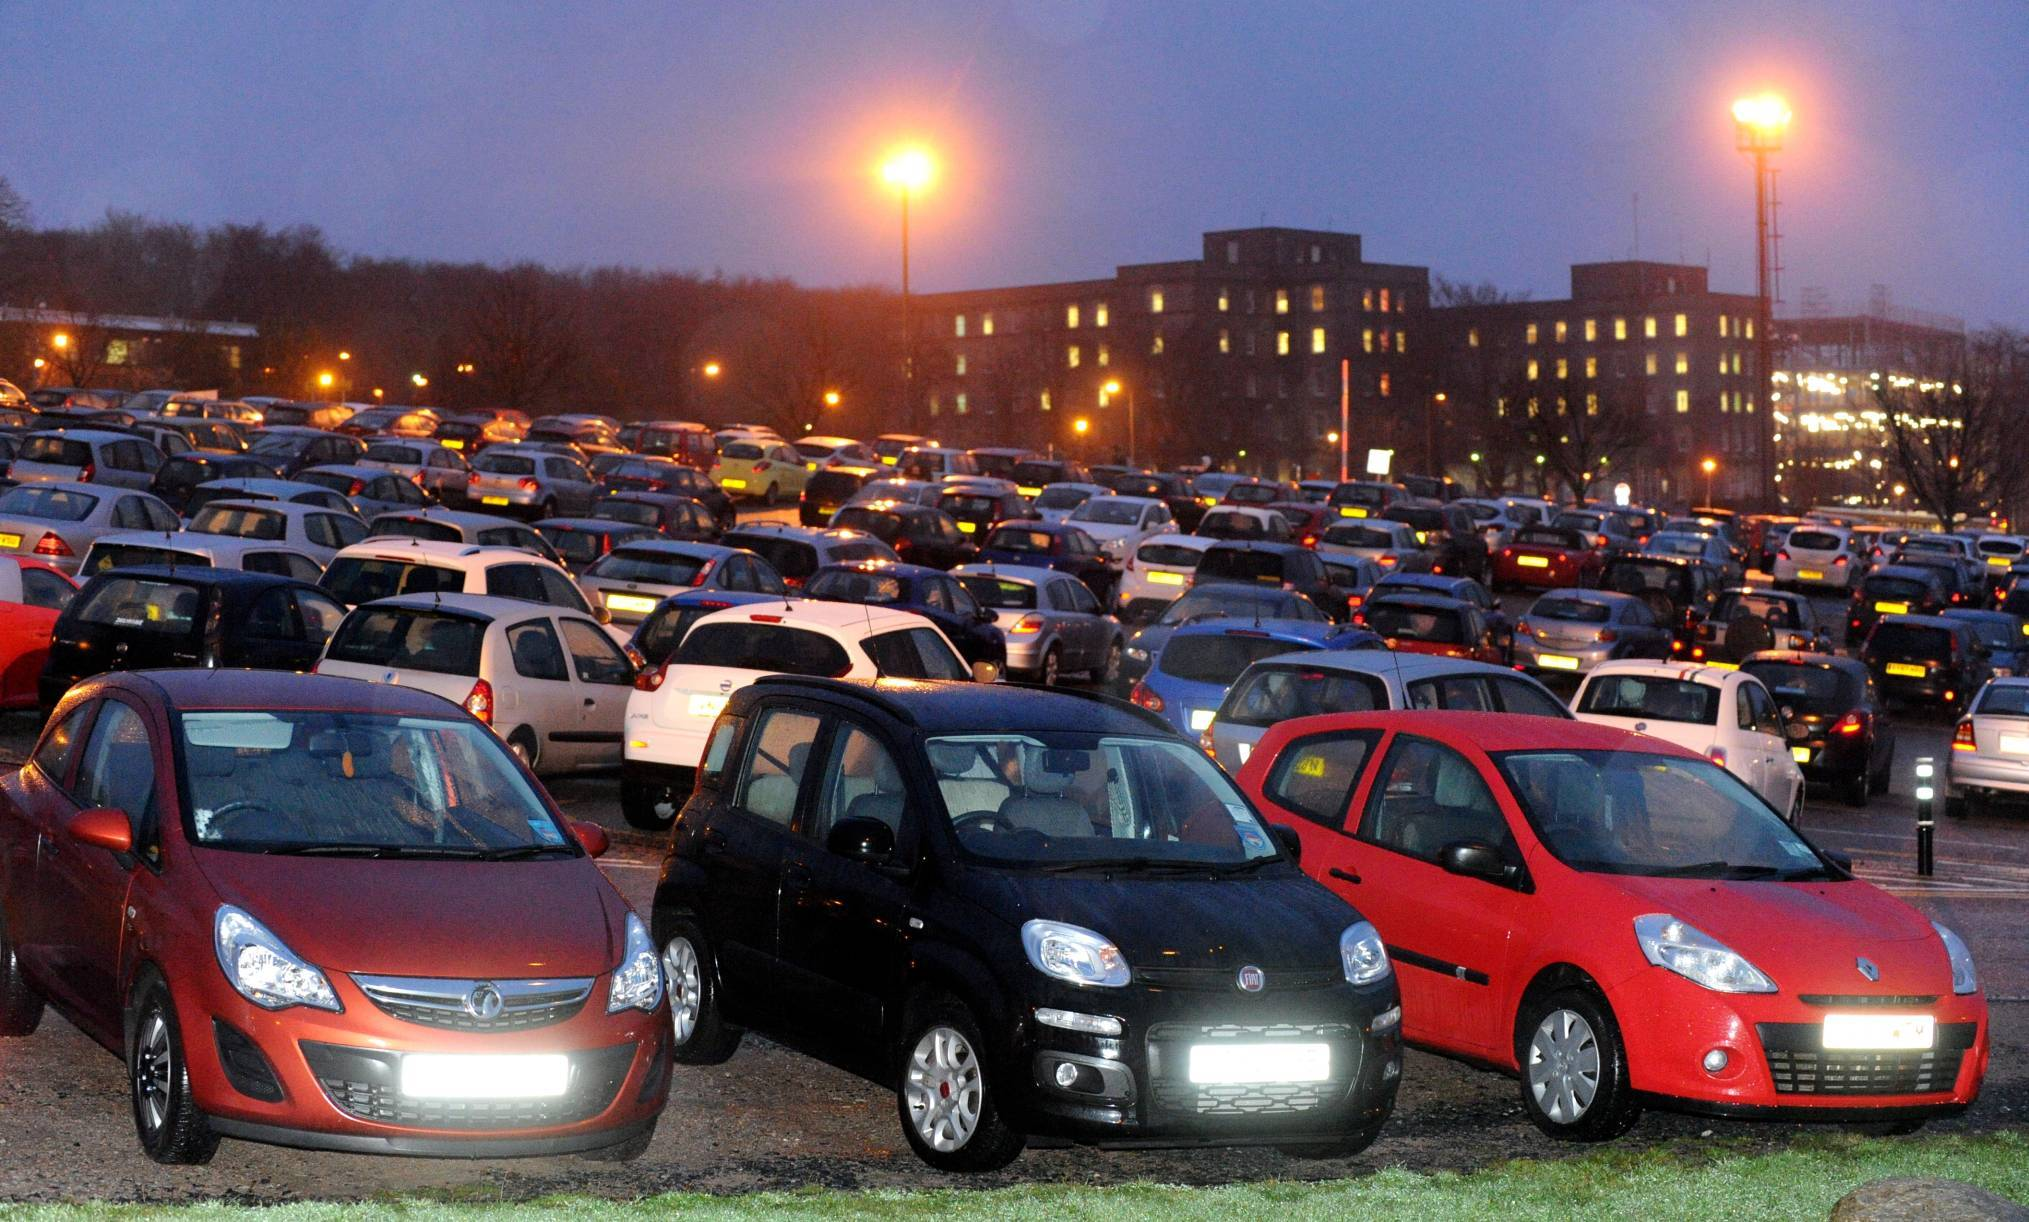 Aberdeen Royal Infirmary car park